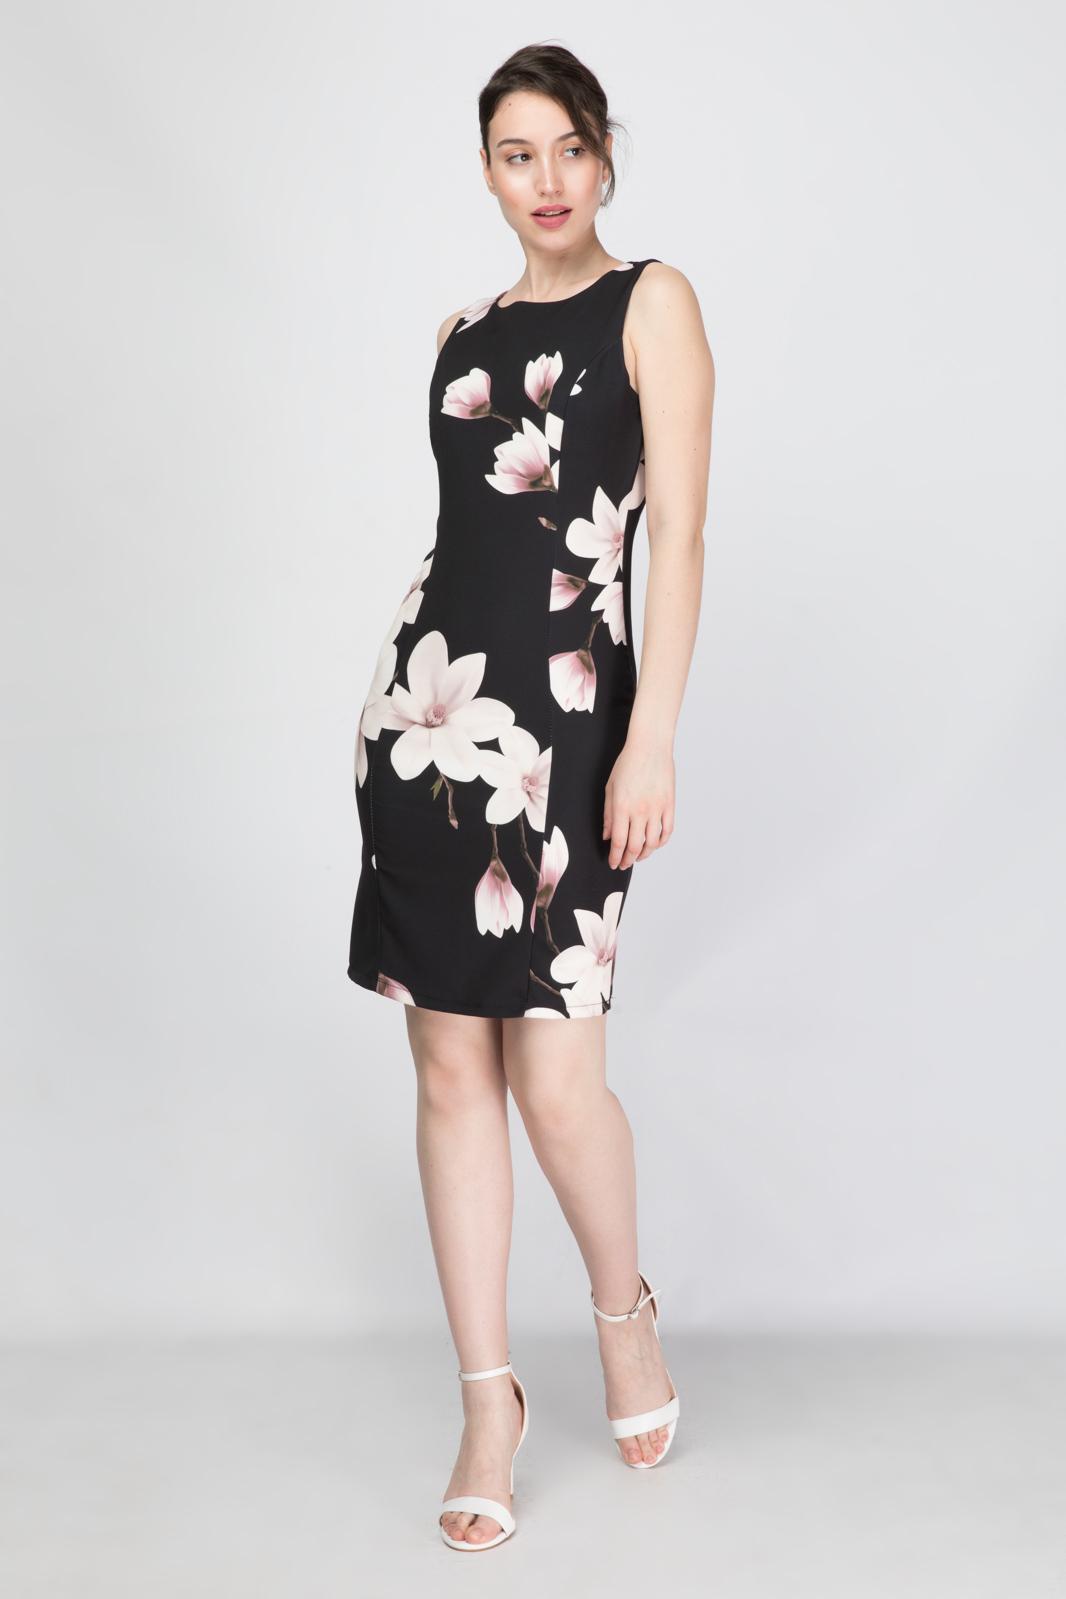 4caed2f6000d Φόρεμα Pencil με Λουλουδάτο Σχέδιο